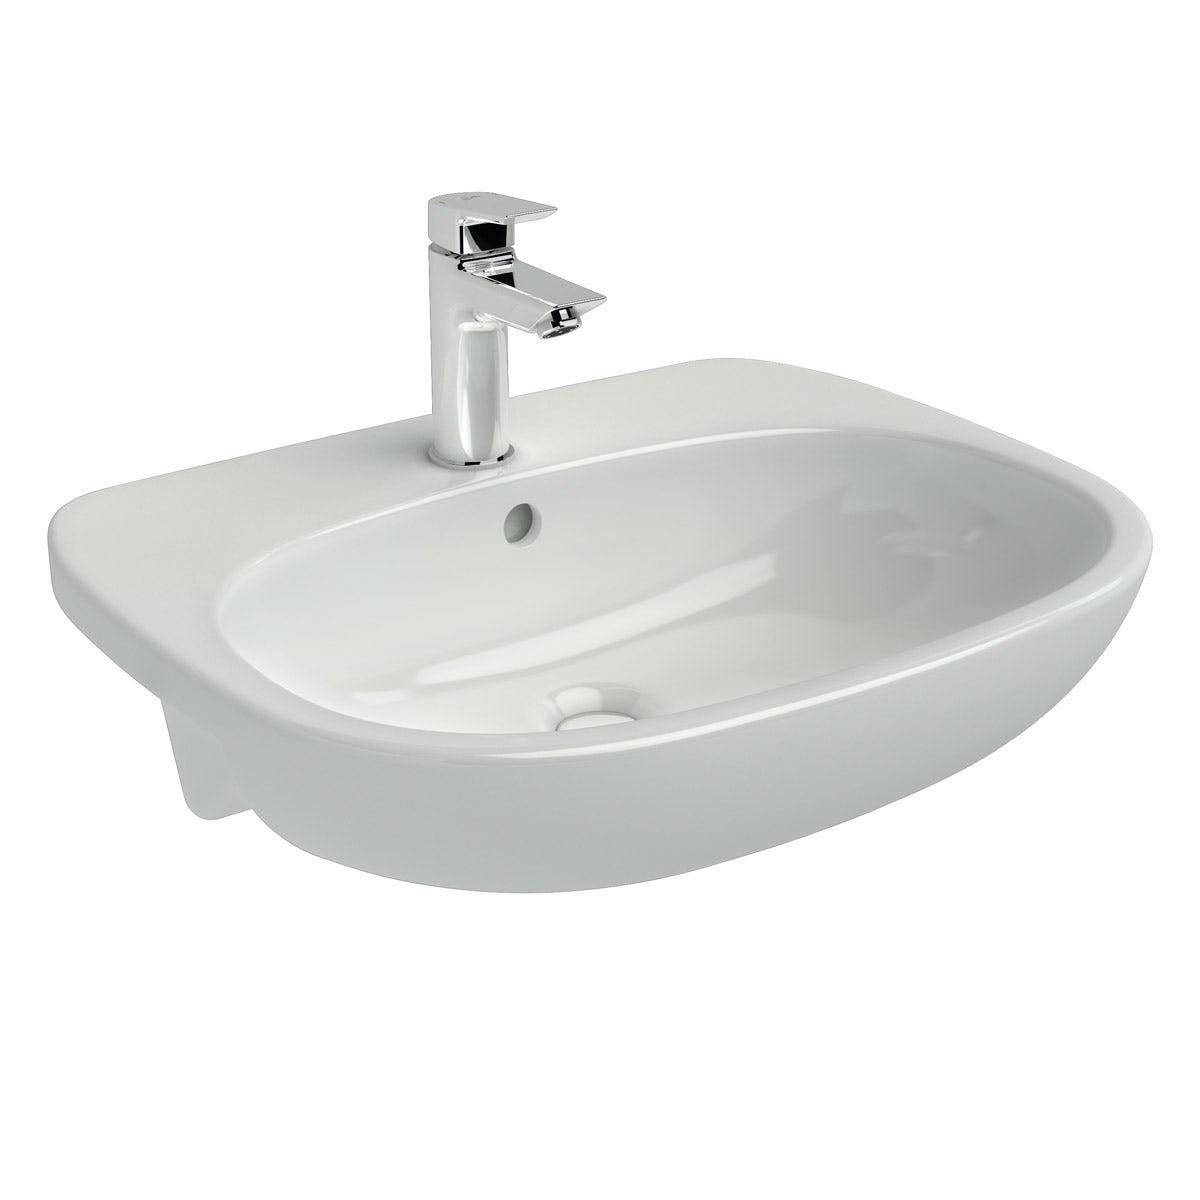 Ideal Standard Tesi 1 tap hole semi recessed countertop basin 550mm